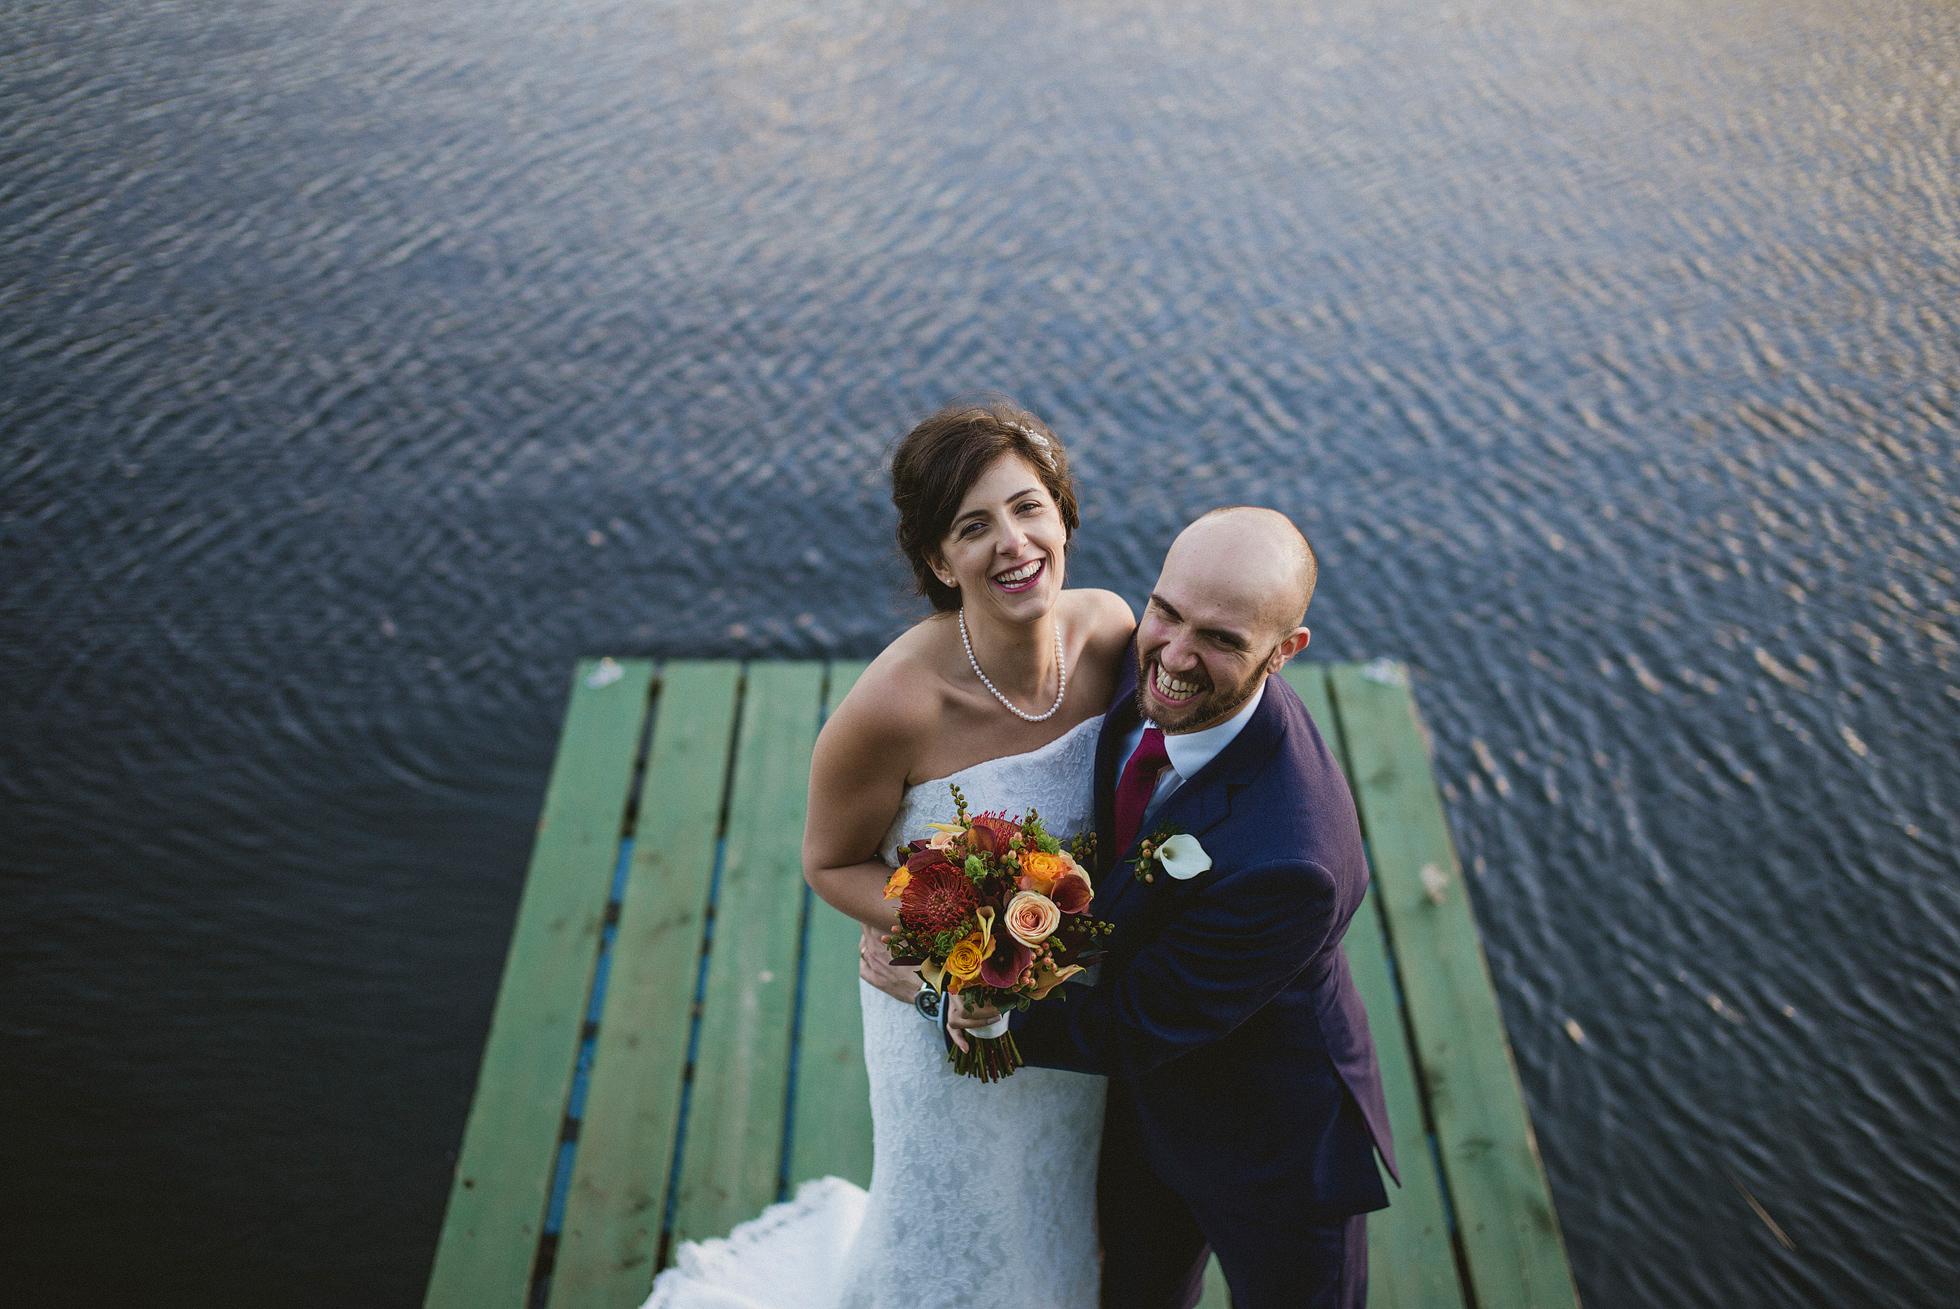 South Farm bride and groom portrait